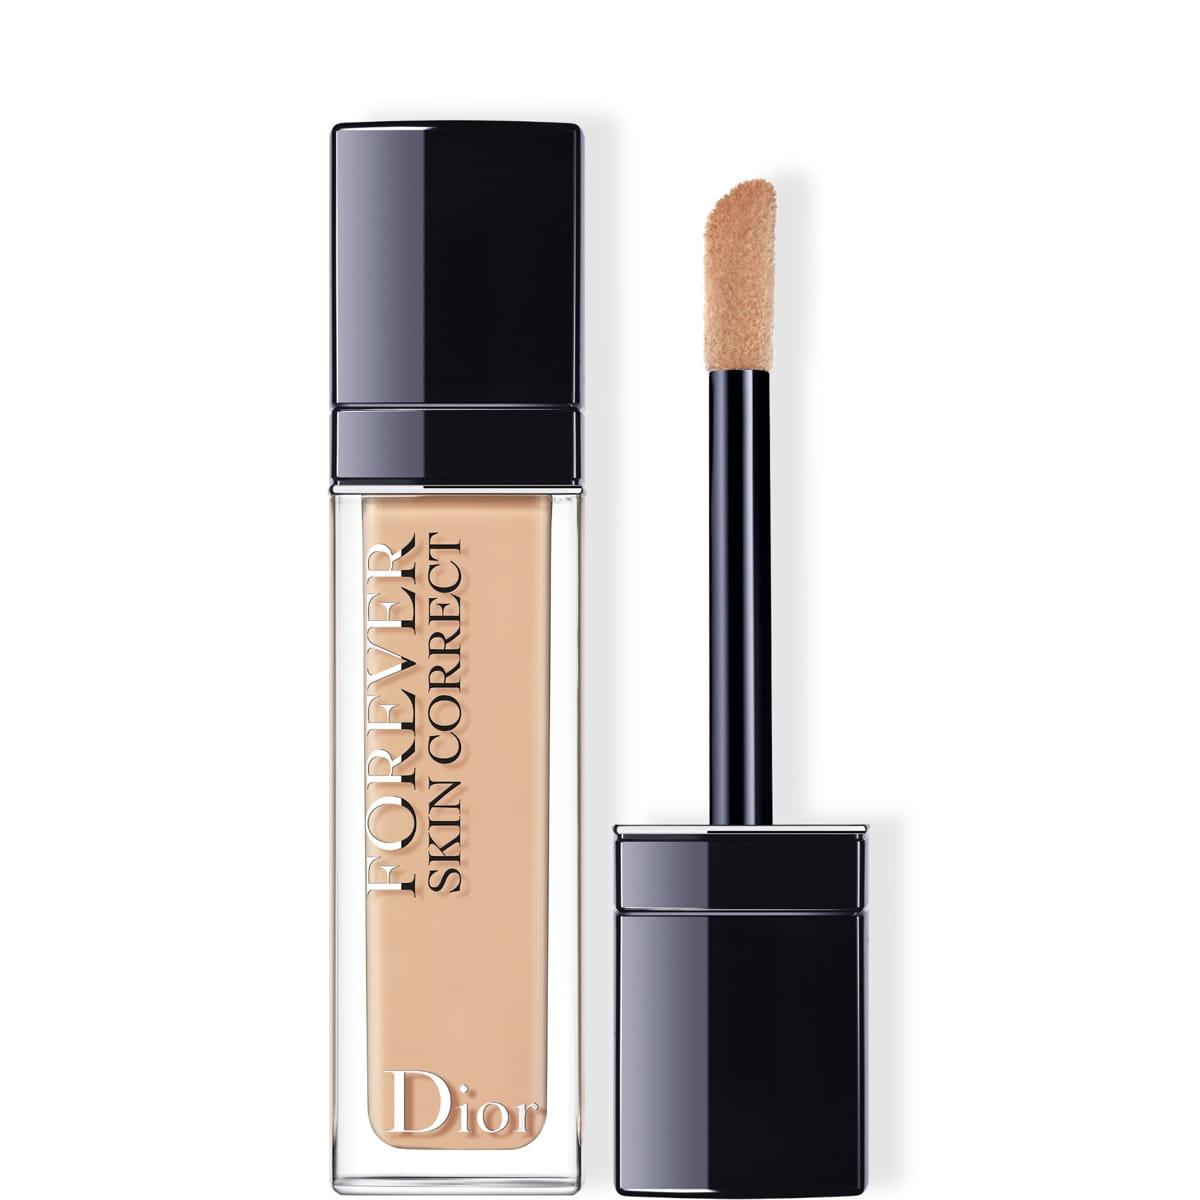 Dior - Forever Skin Correct - Correcteur teint 24h